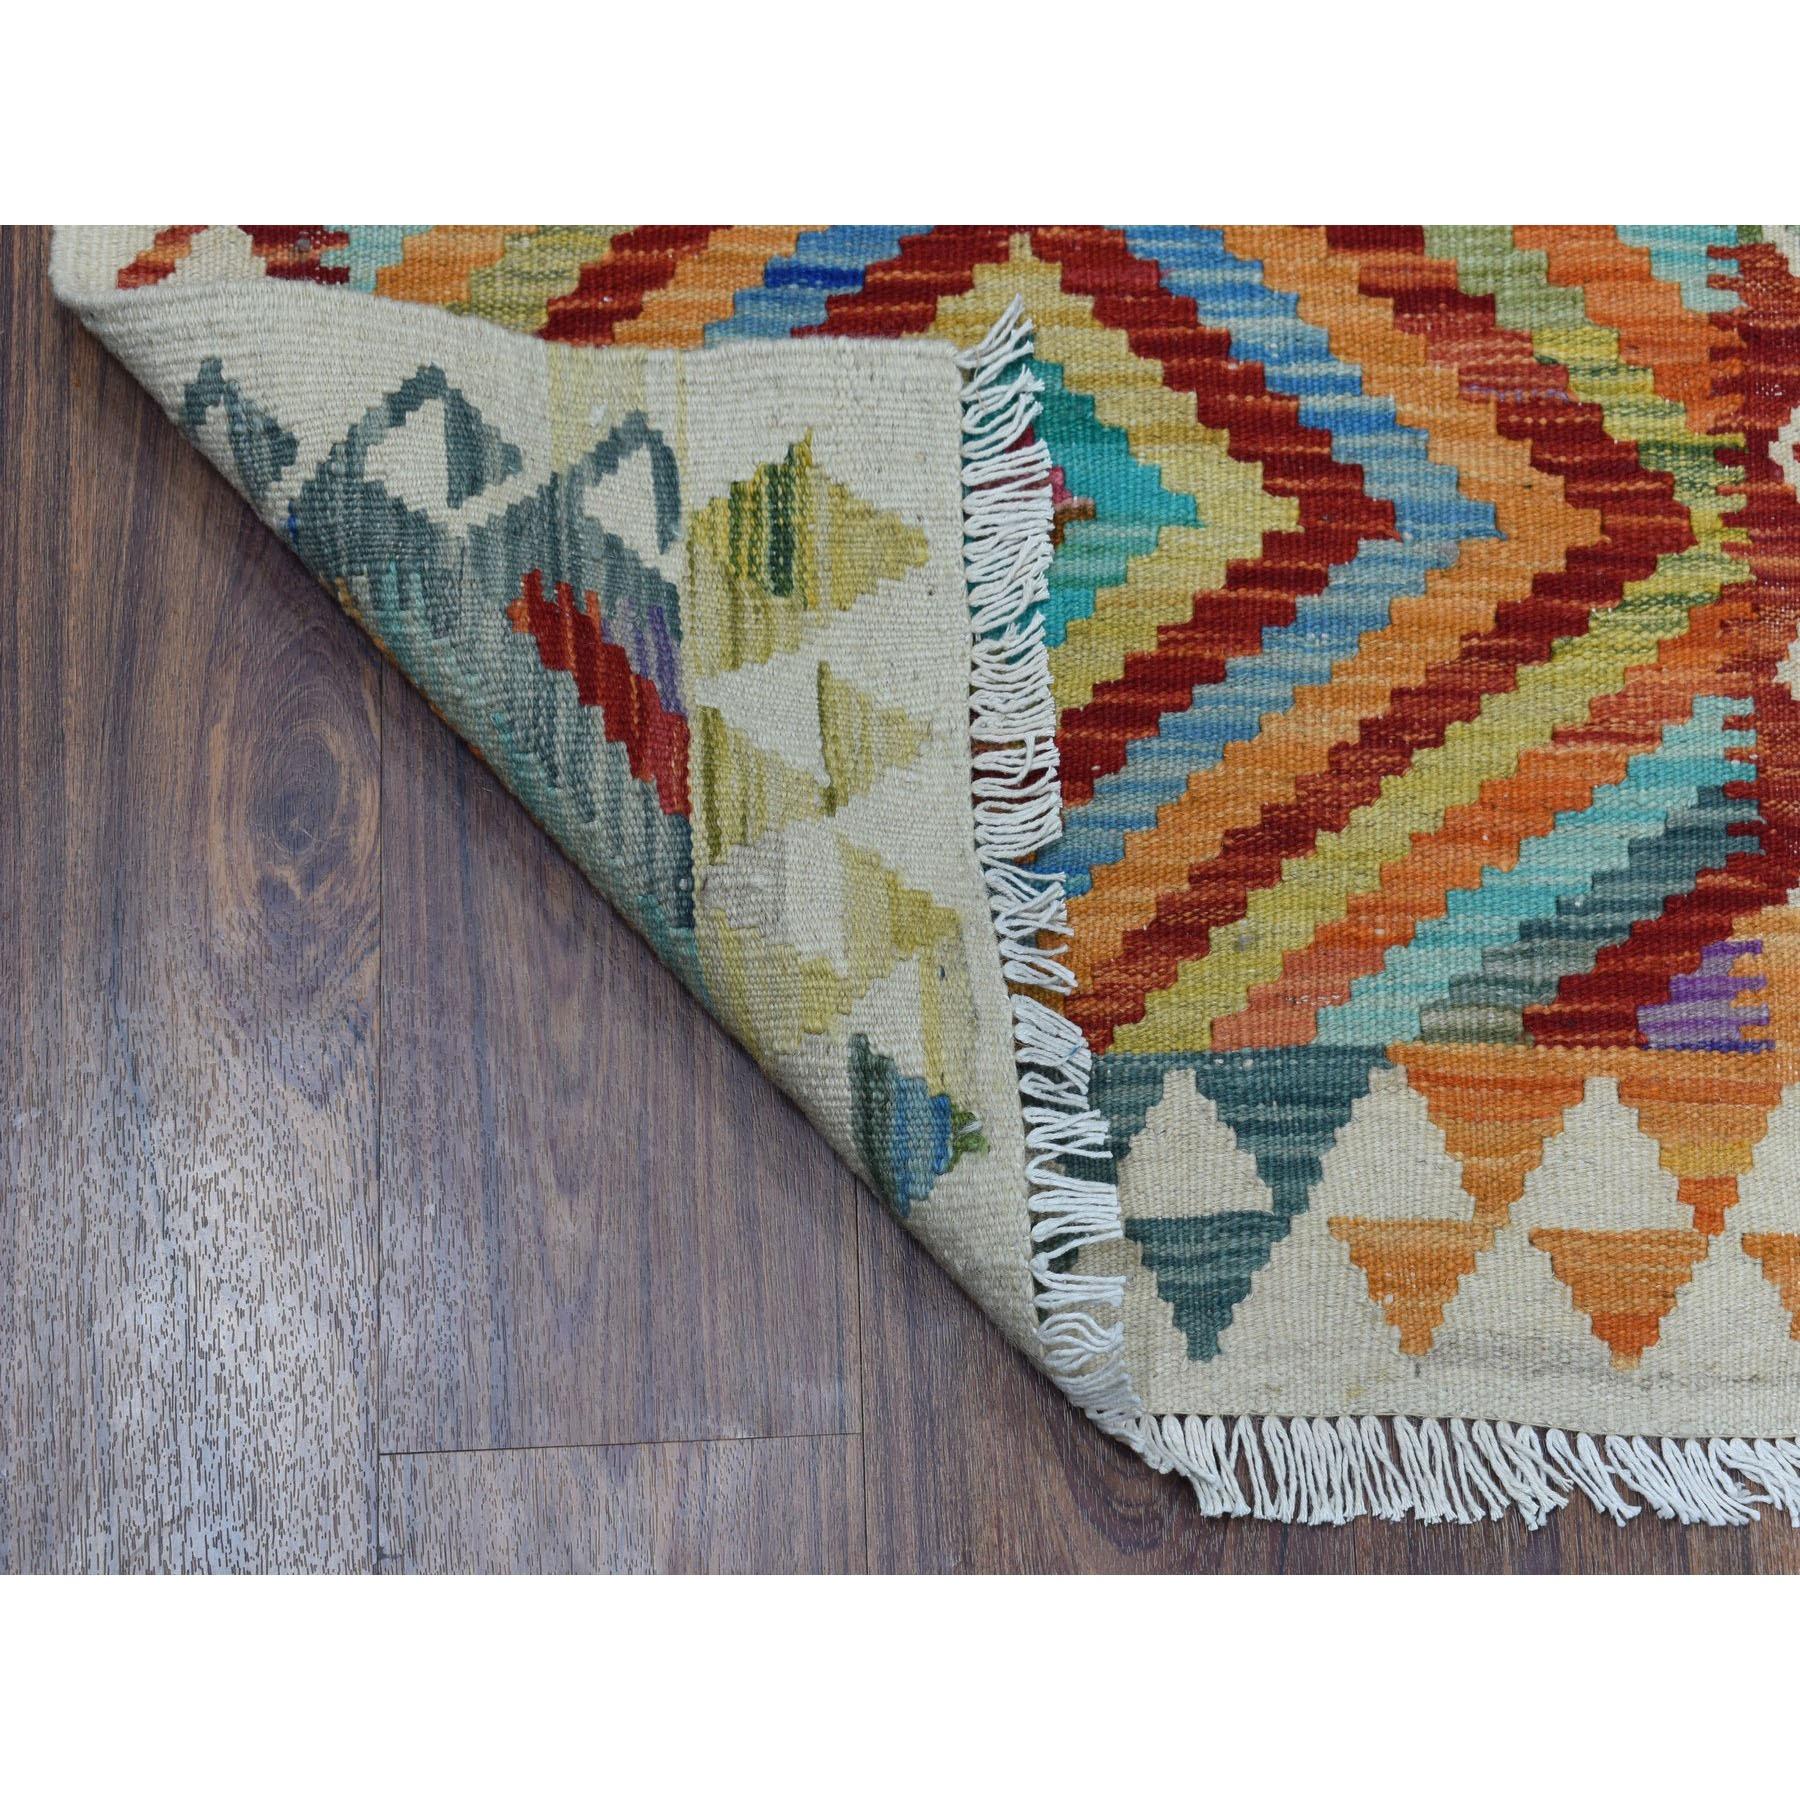 2-1 x2-10  Veggie Dyes Afghan Kilim Pure Wool Hand Woven Oriental Rug